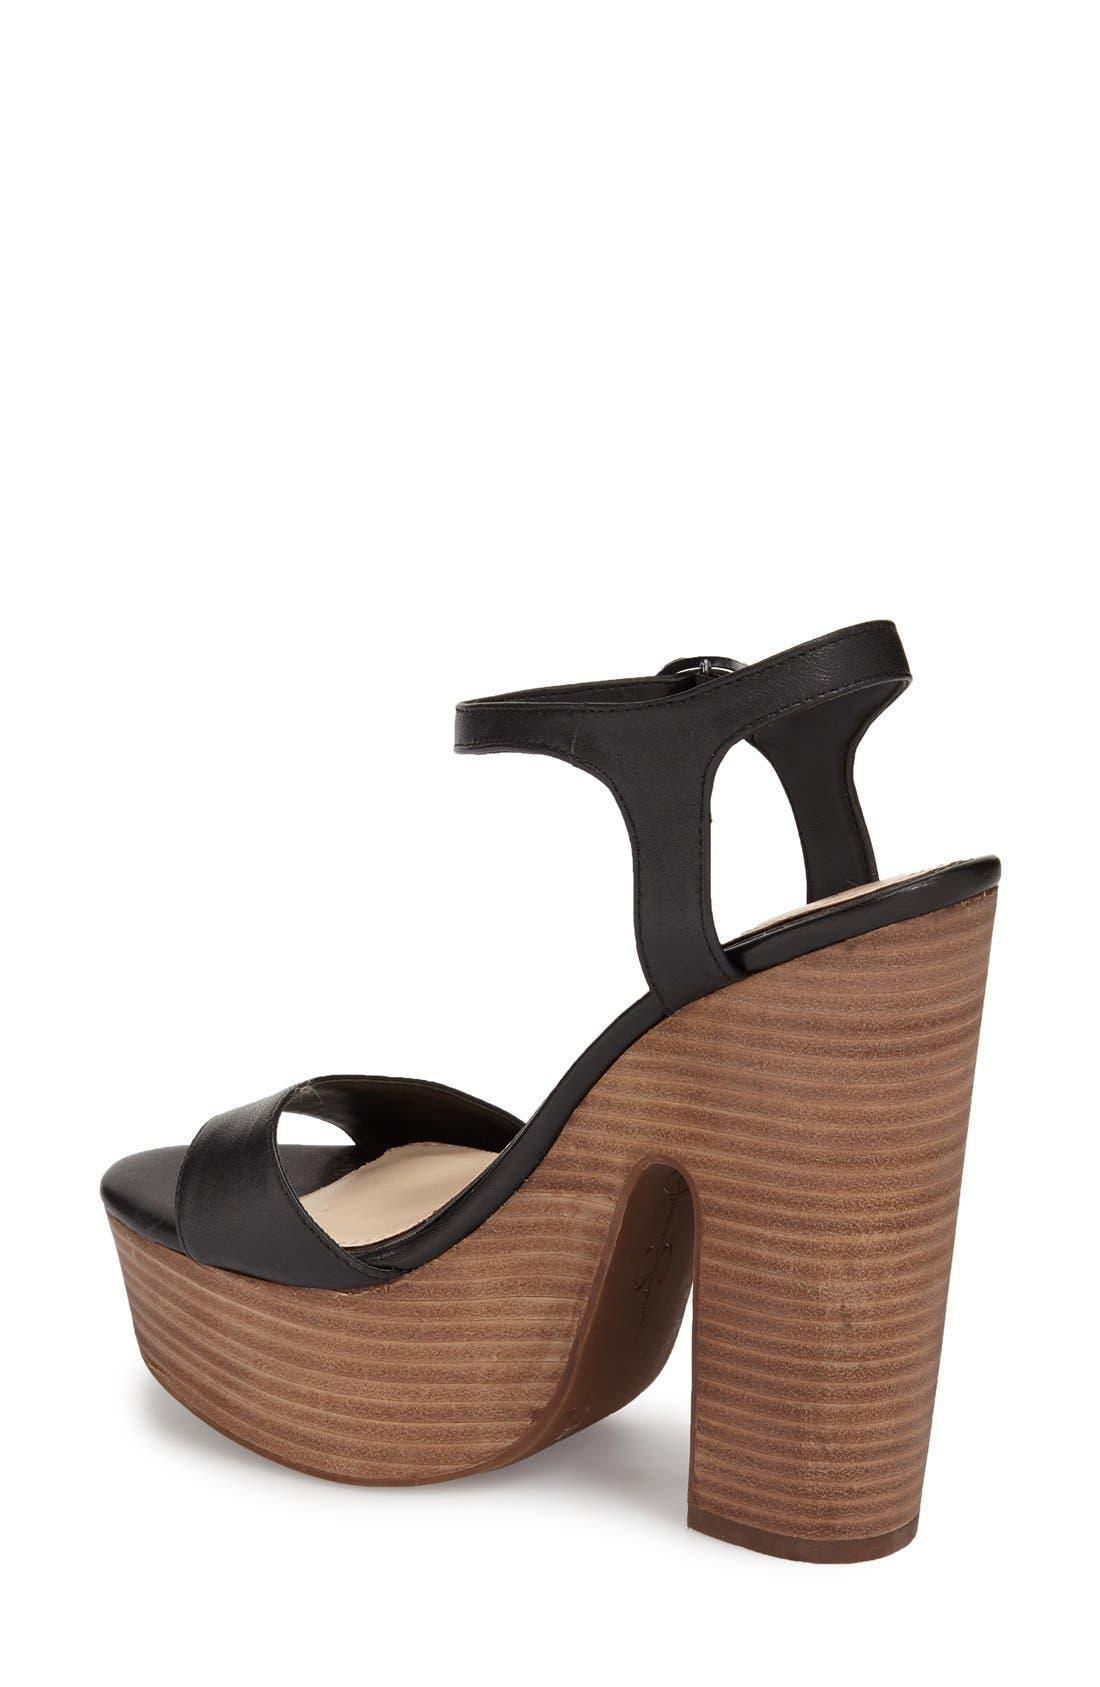 Alternate Image 2  - Jessica Simpson 'Whirl' Platform Sandal (Women)